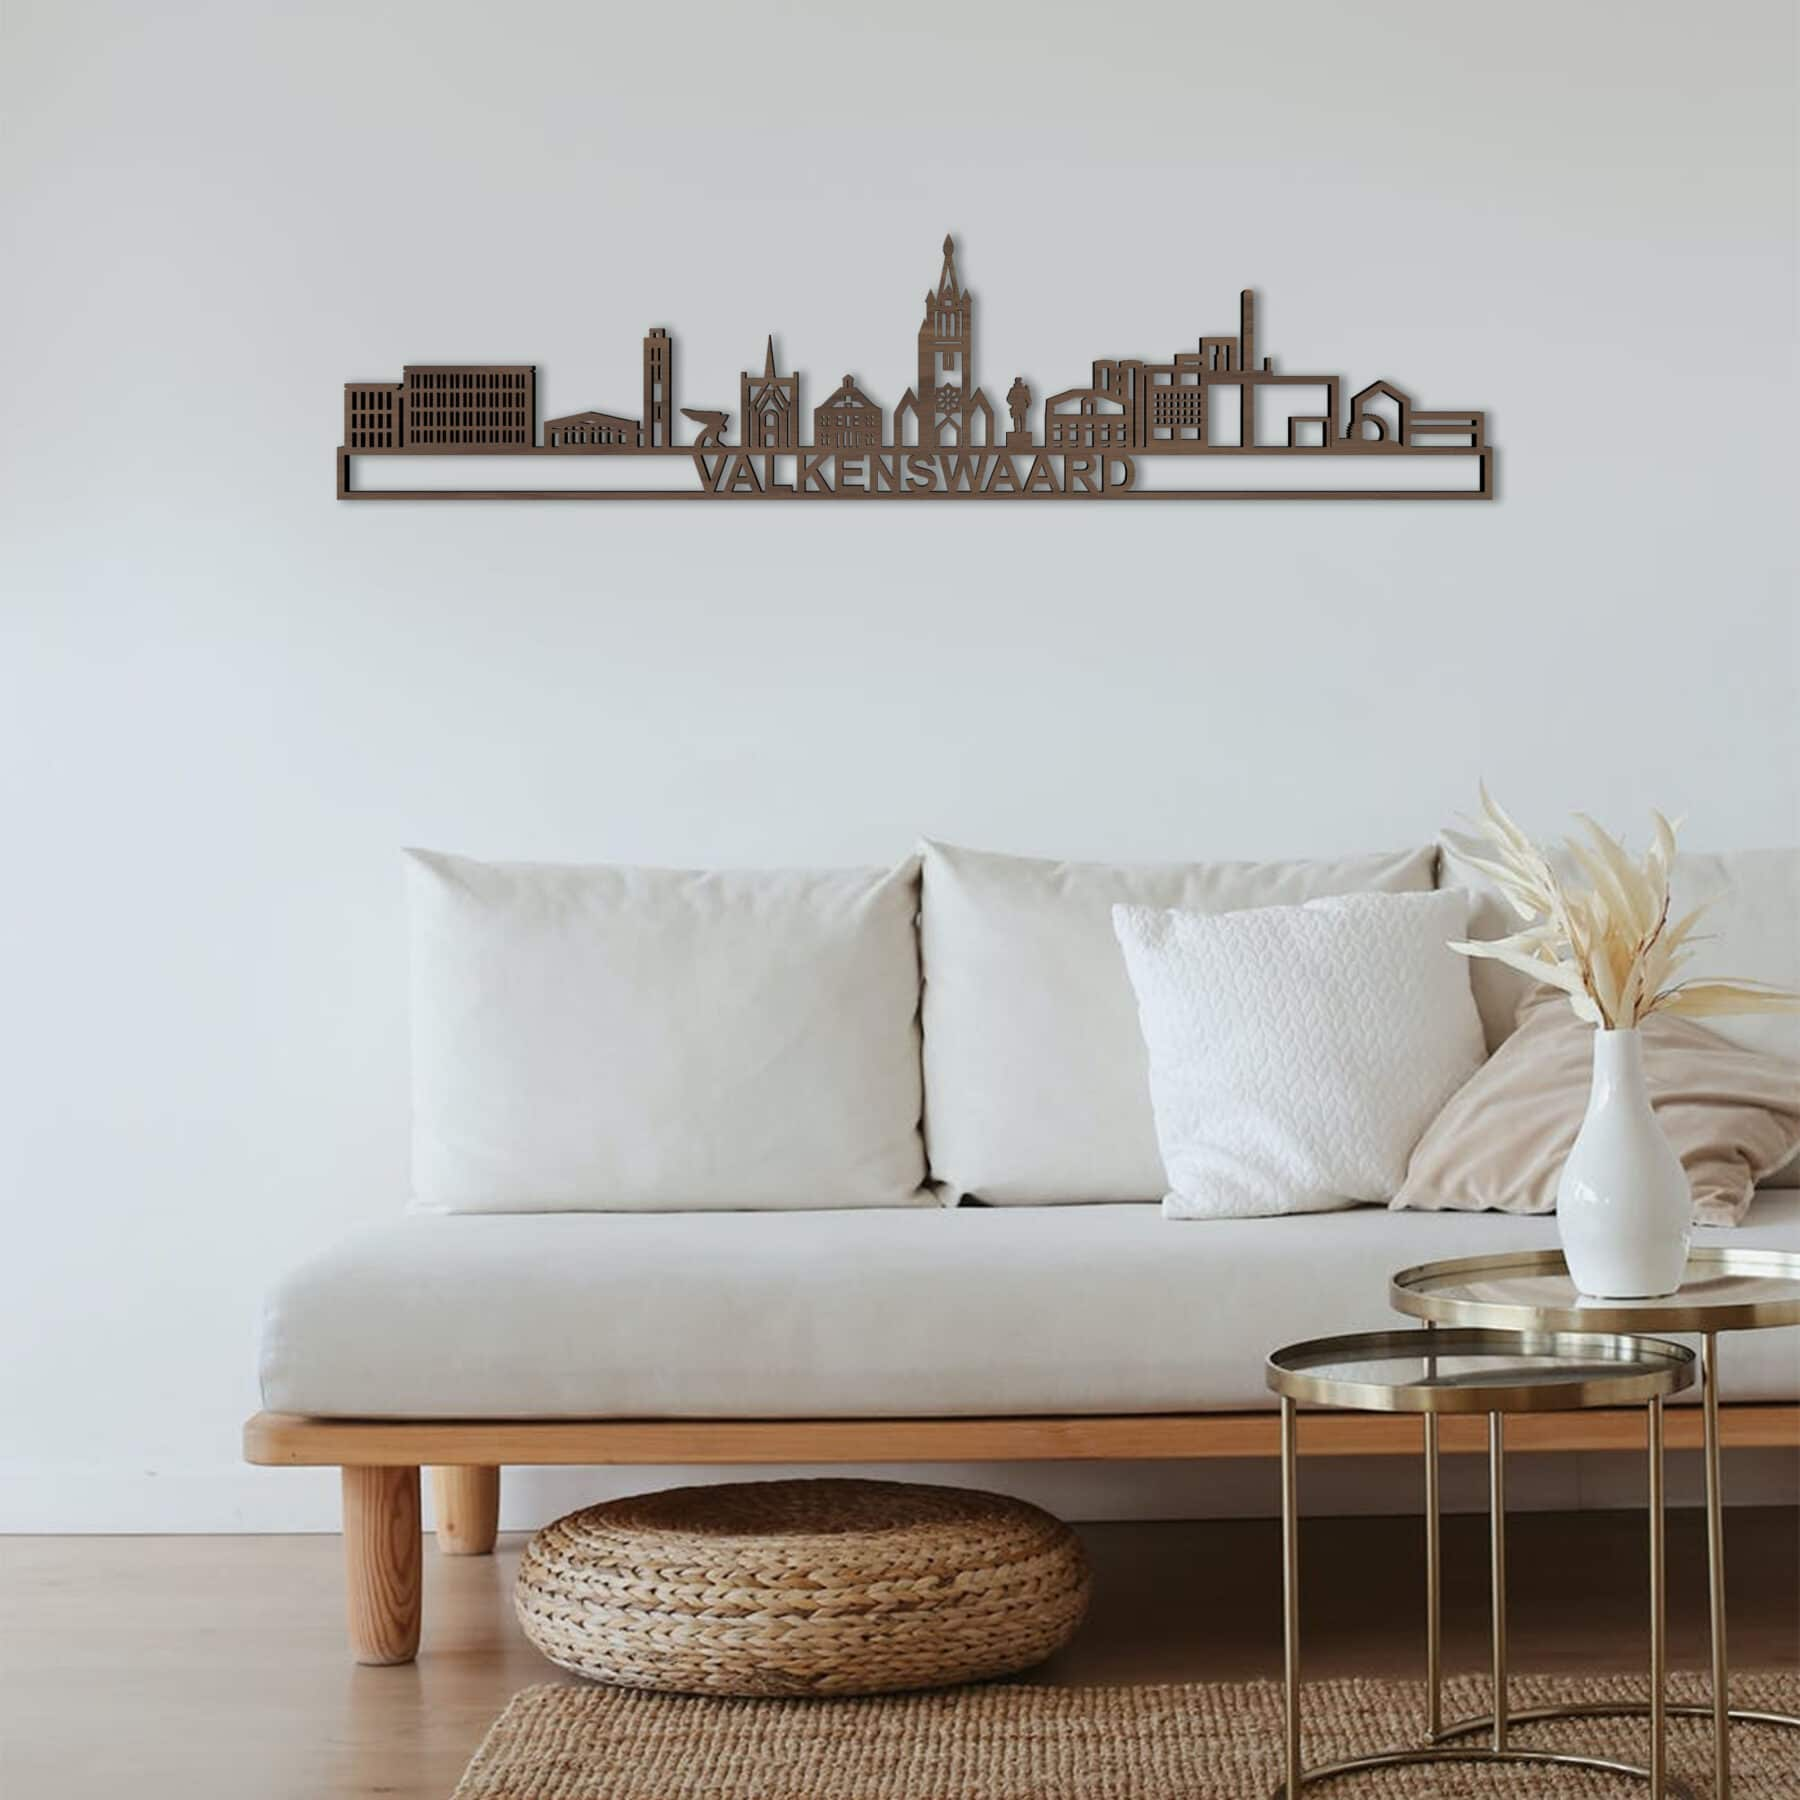 Skyline Valkenswaard hout